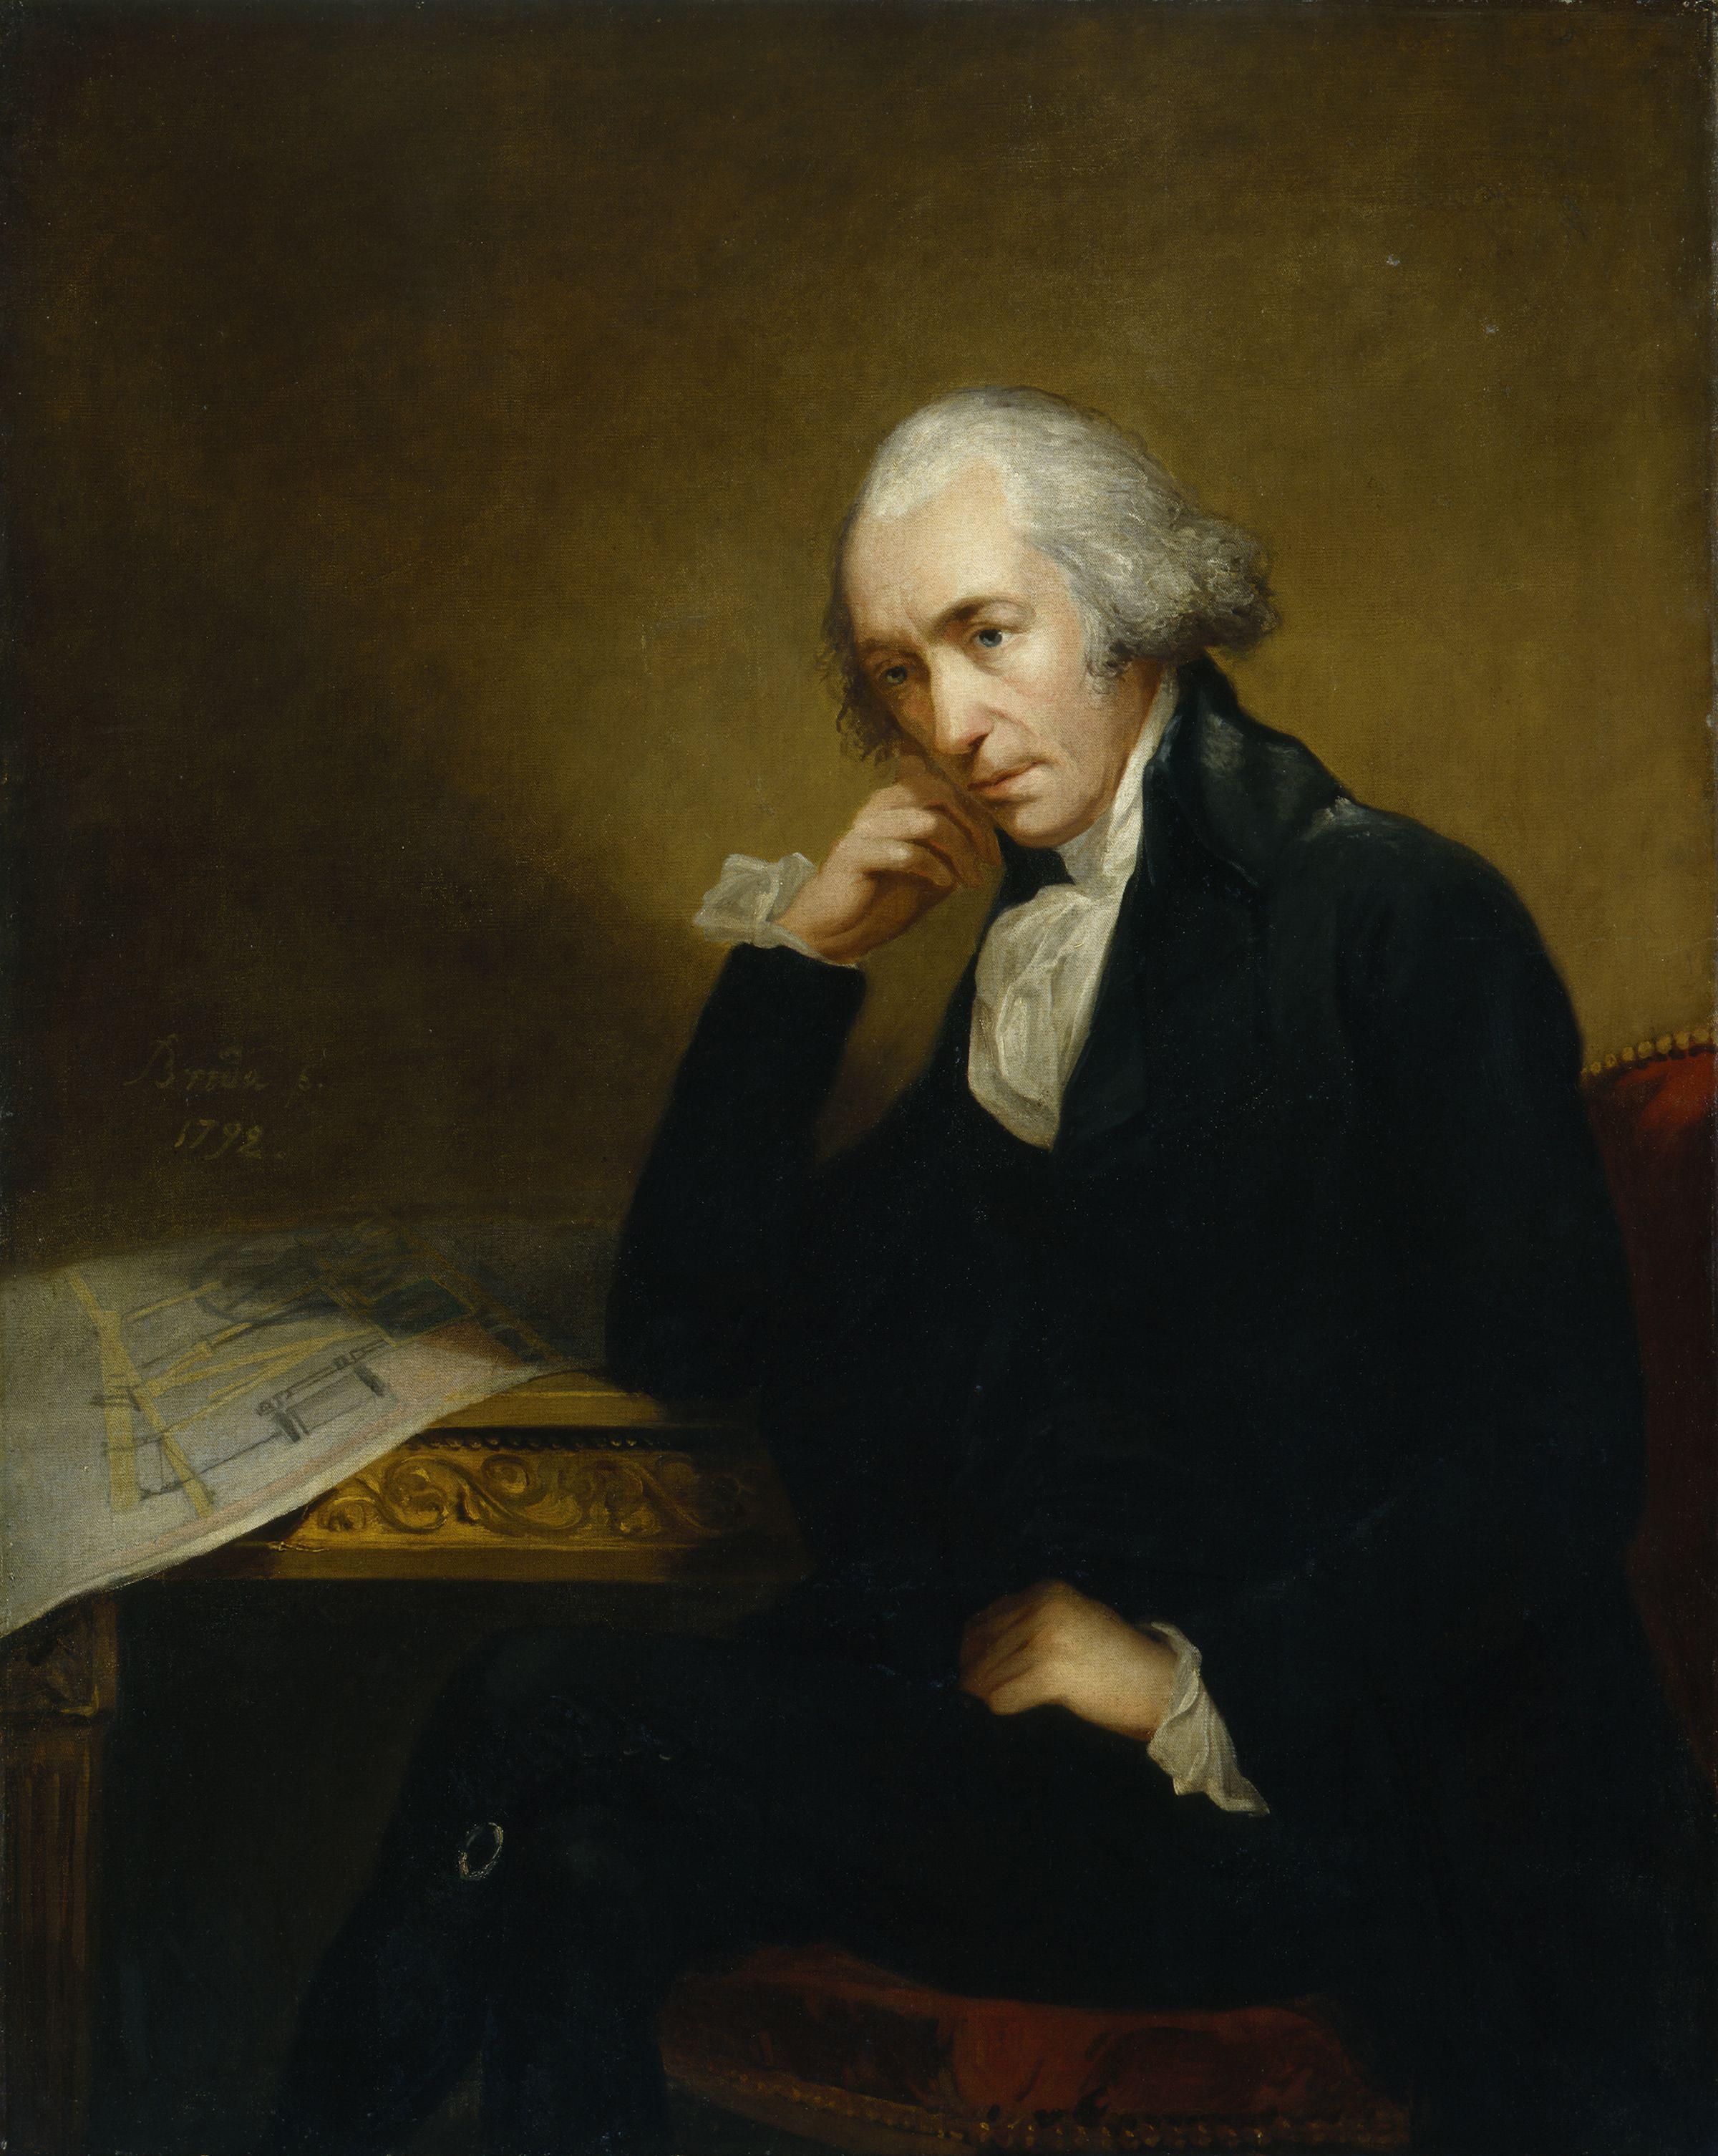 Portrait of James Watt, the noted Scottish inventor and mechanical engineer by Carl Frederik von Breda.